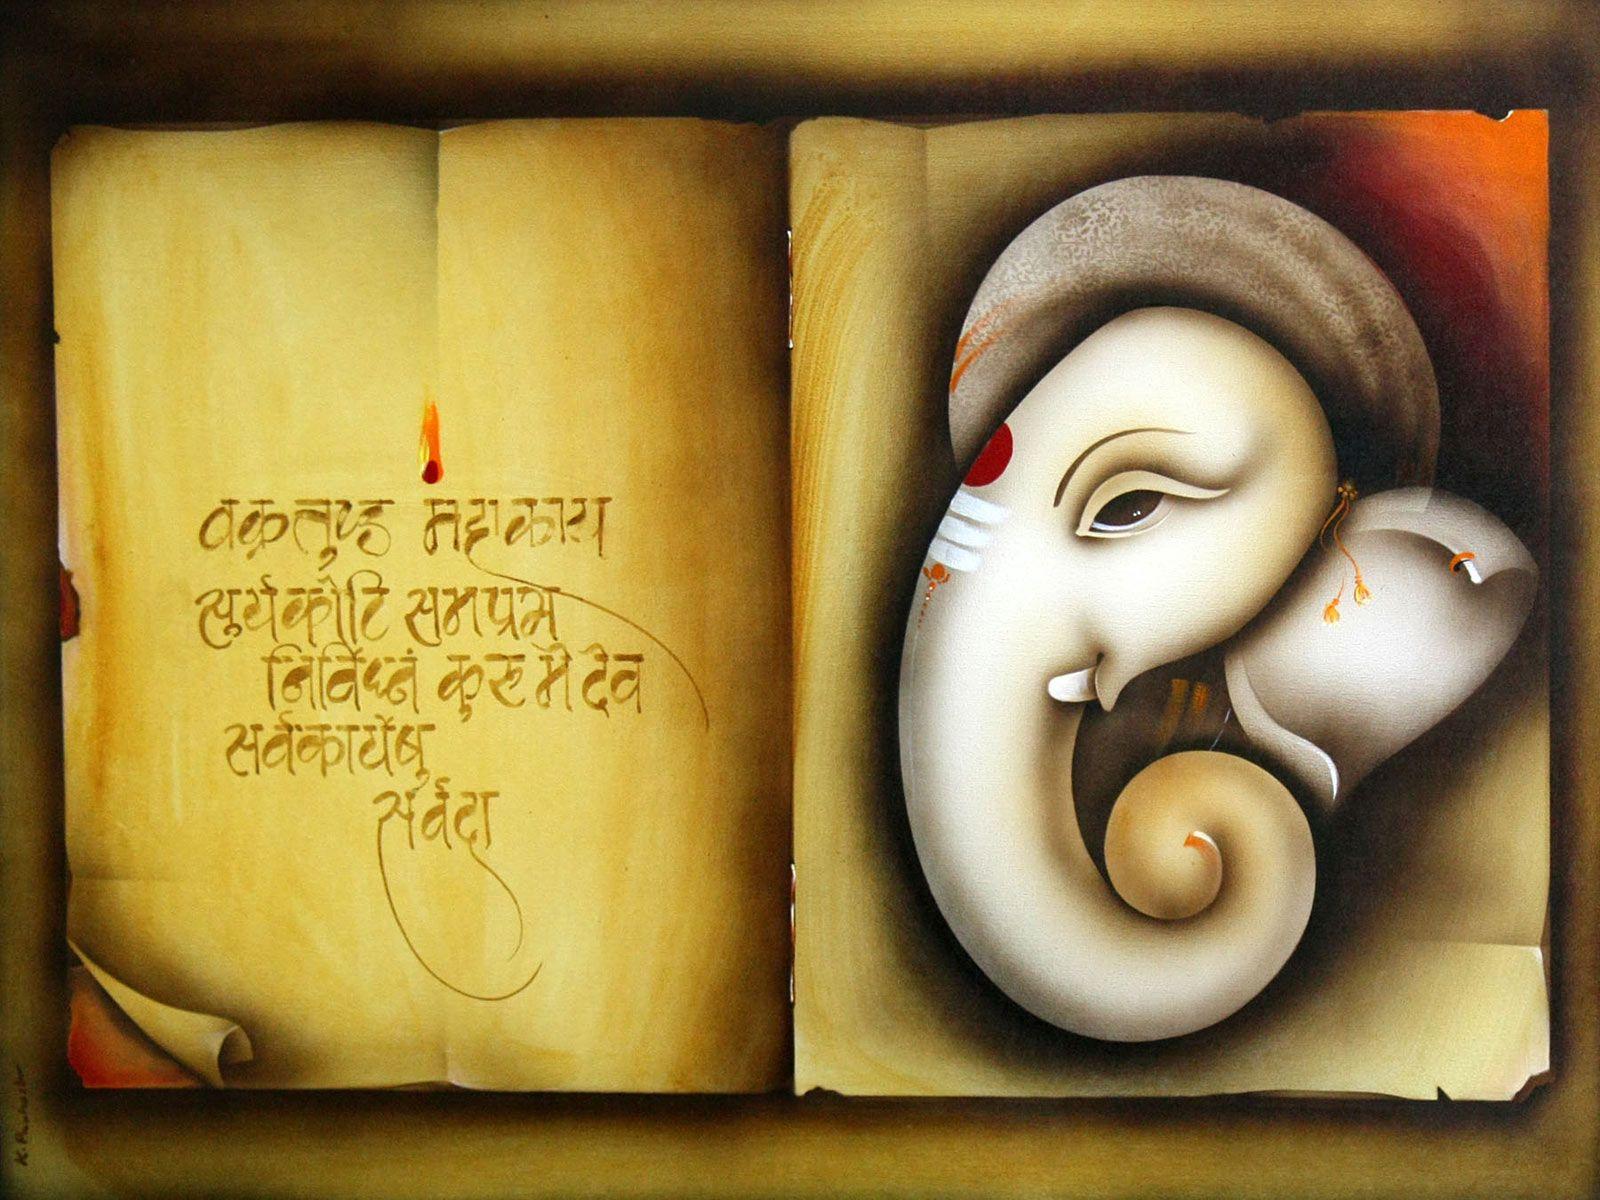 Ganesh Mantra Ganpati Wallpaper